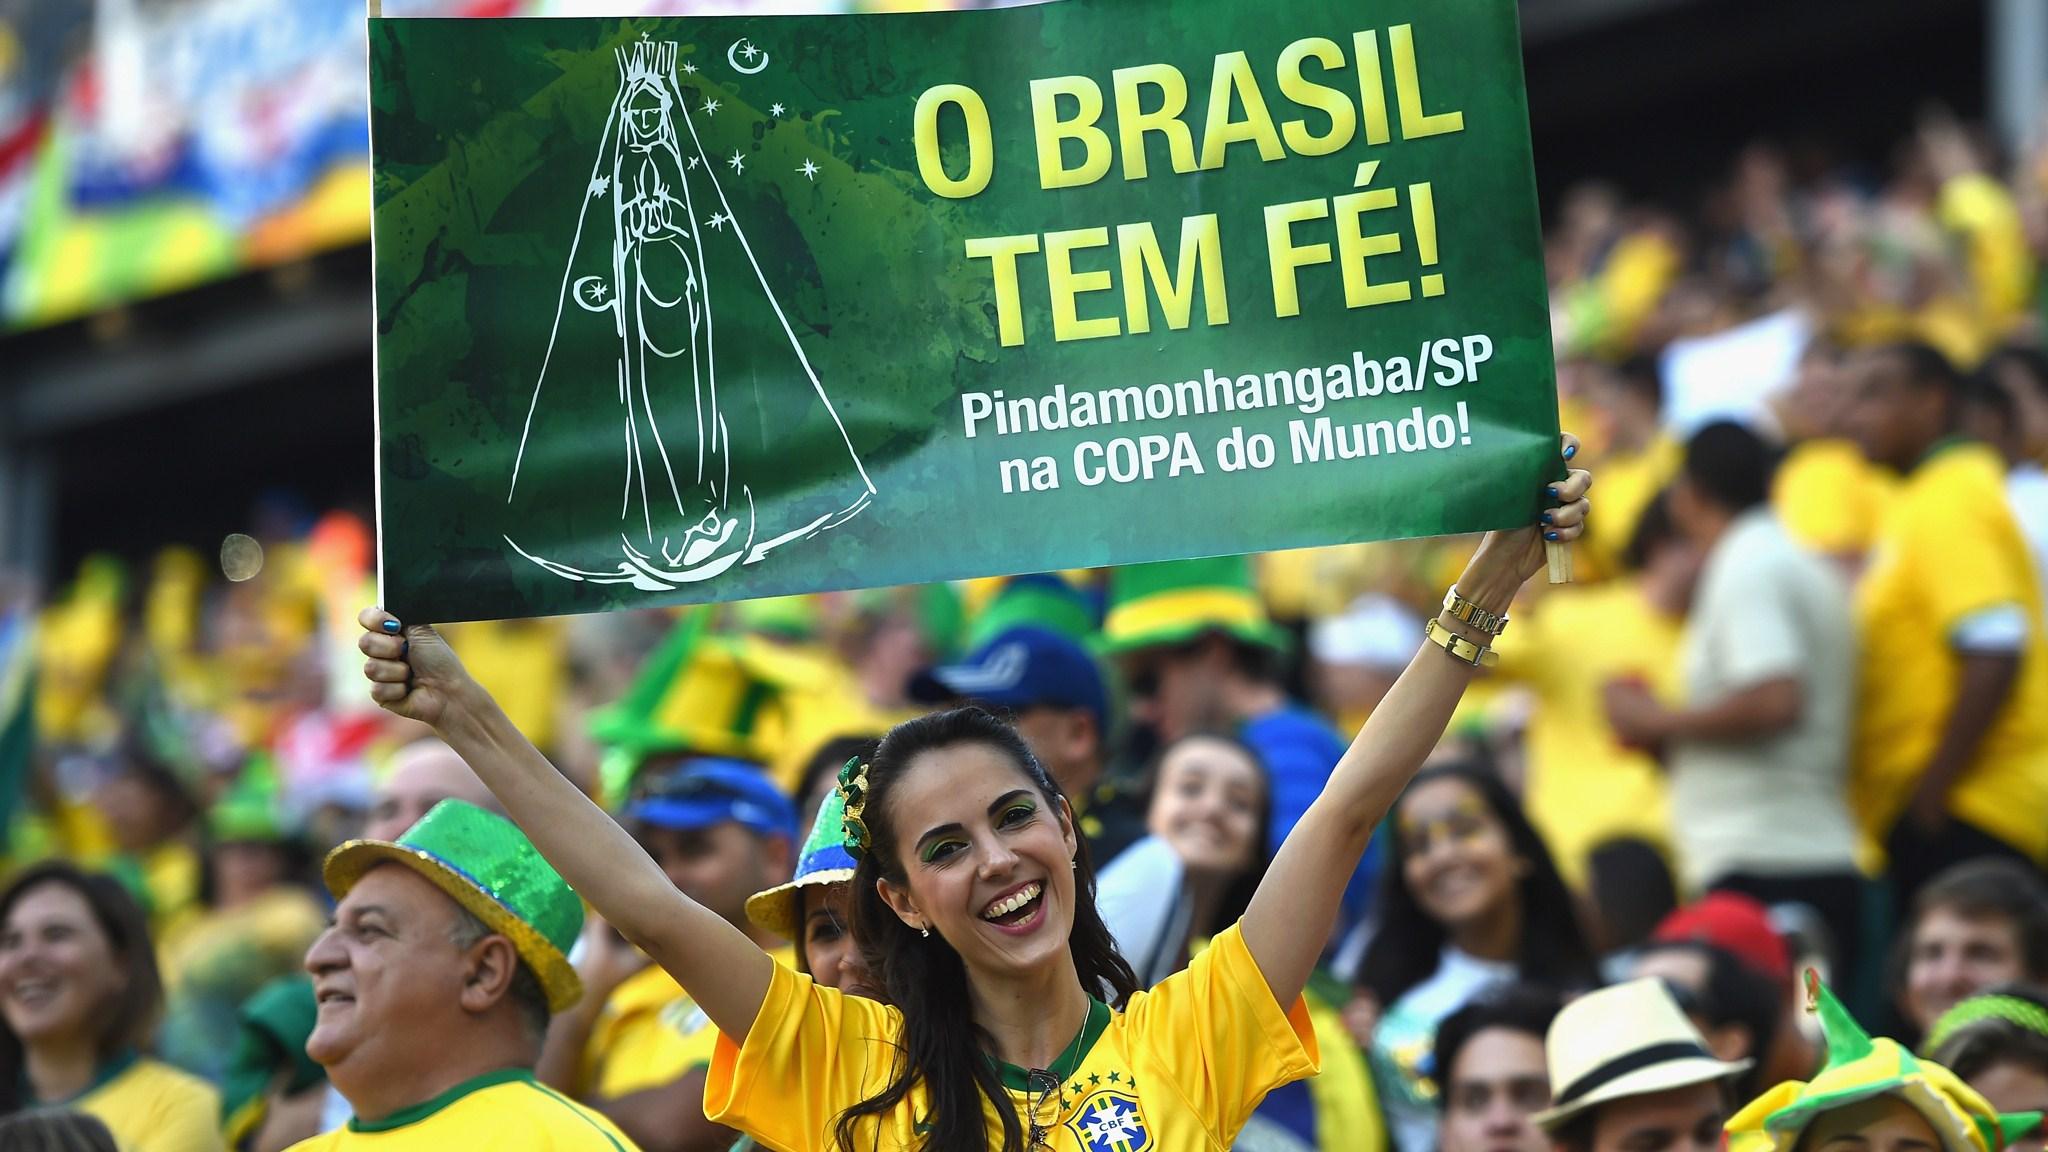 188 - Brazil-Croatia [3-1] -- 12 Jun 2014 - 17-00 -- Sao Paulo - Arena Corinthians - kuaza